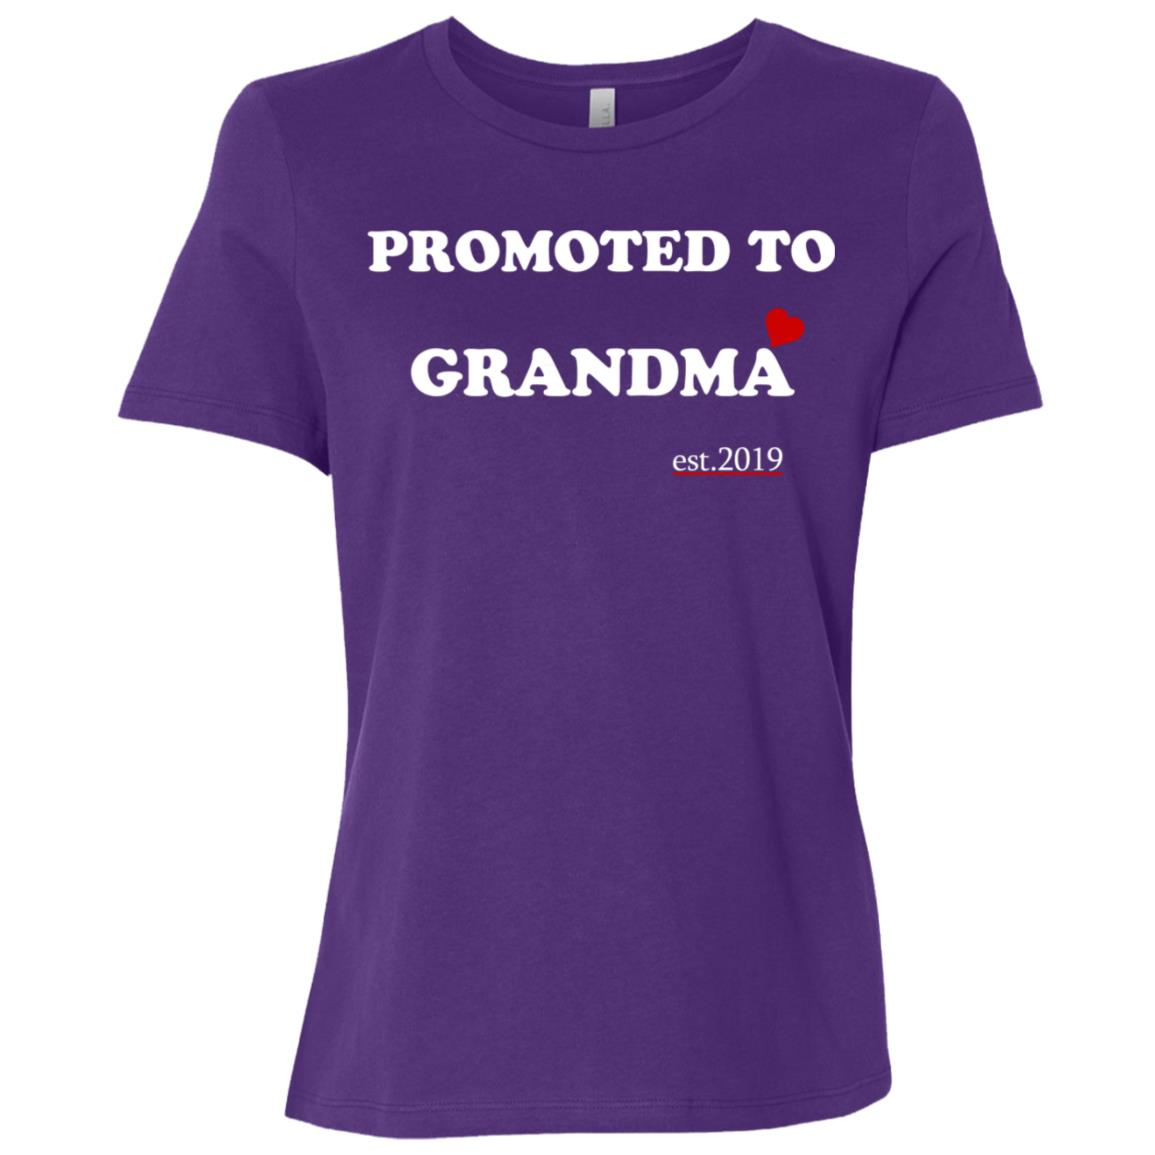 Promoted to grandma 2019-1 Women Short Sleeve T-Shirt